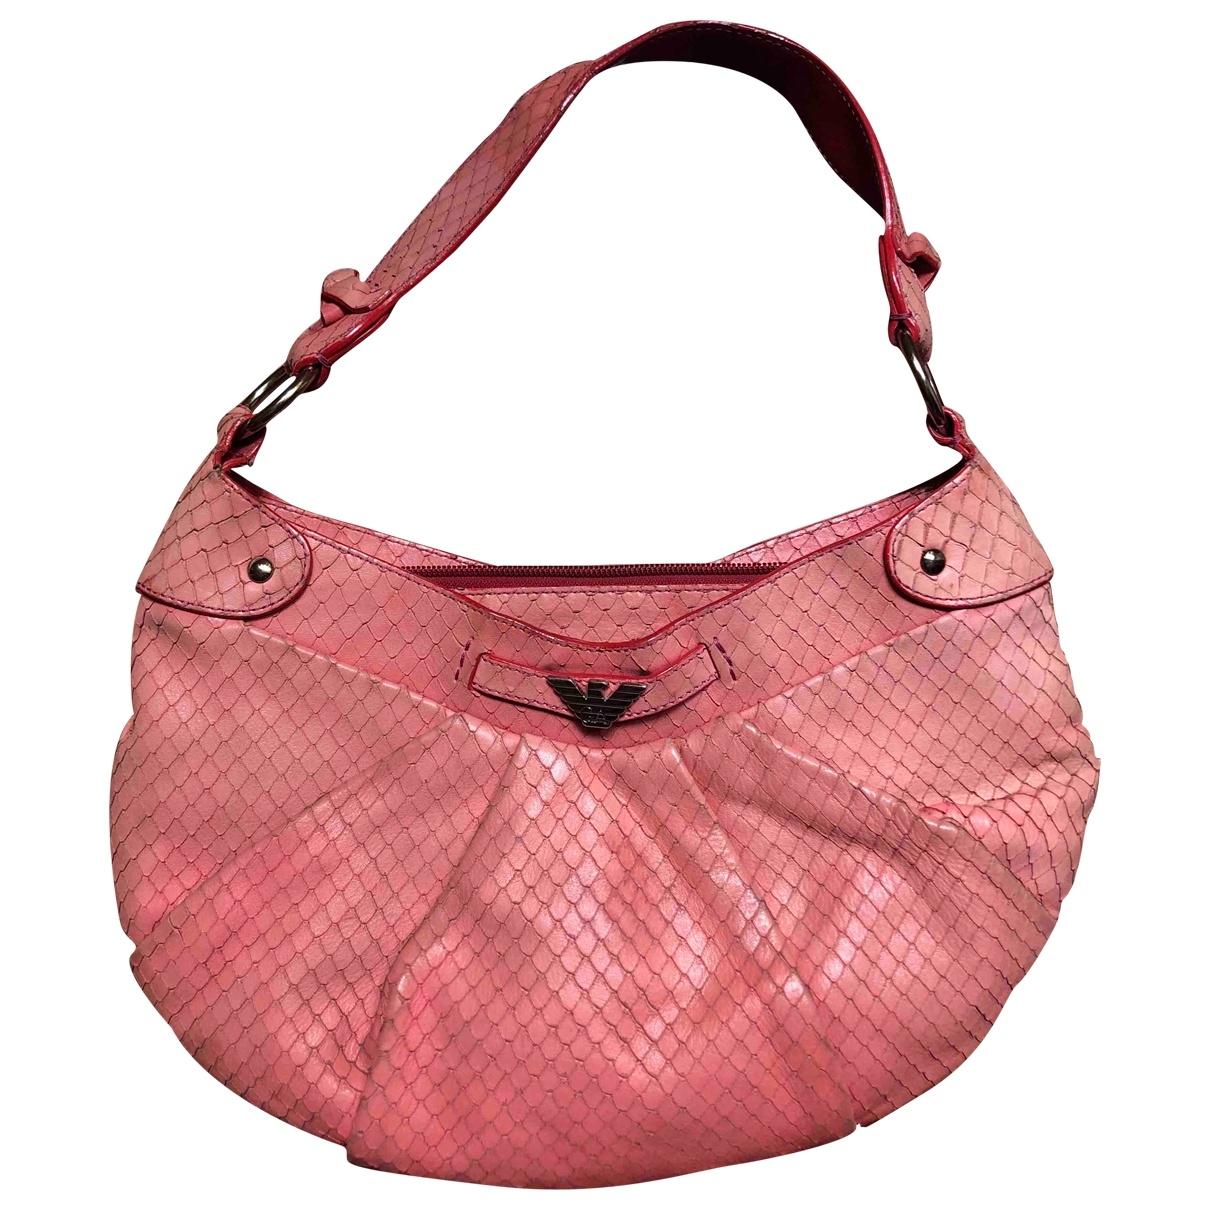 Emporio Armani \N Pink Leather handbag for Women \N